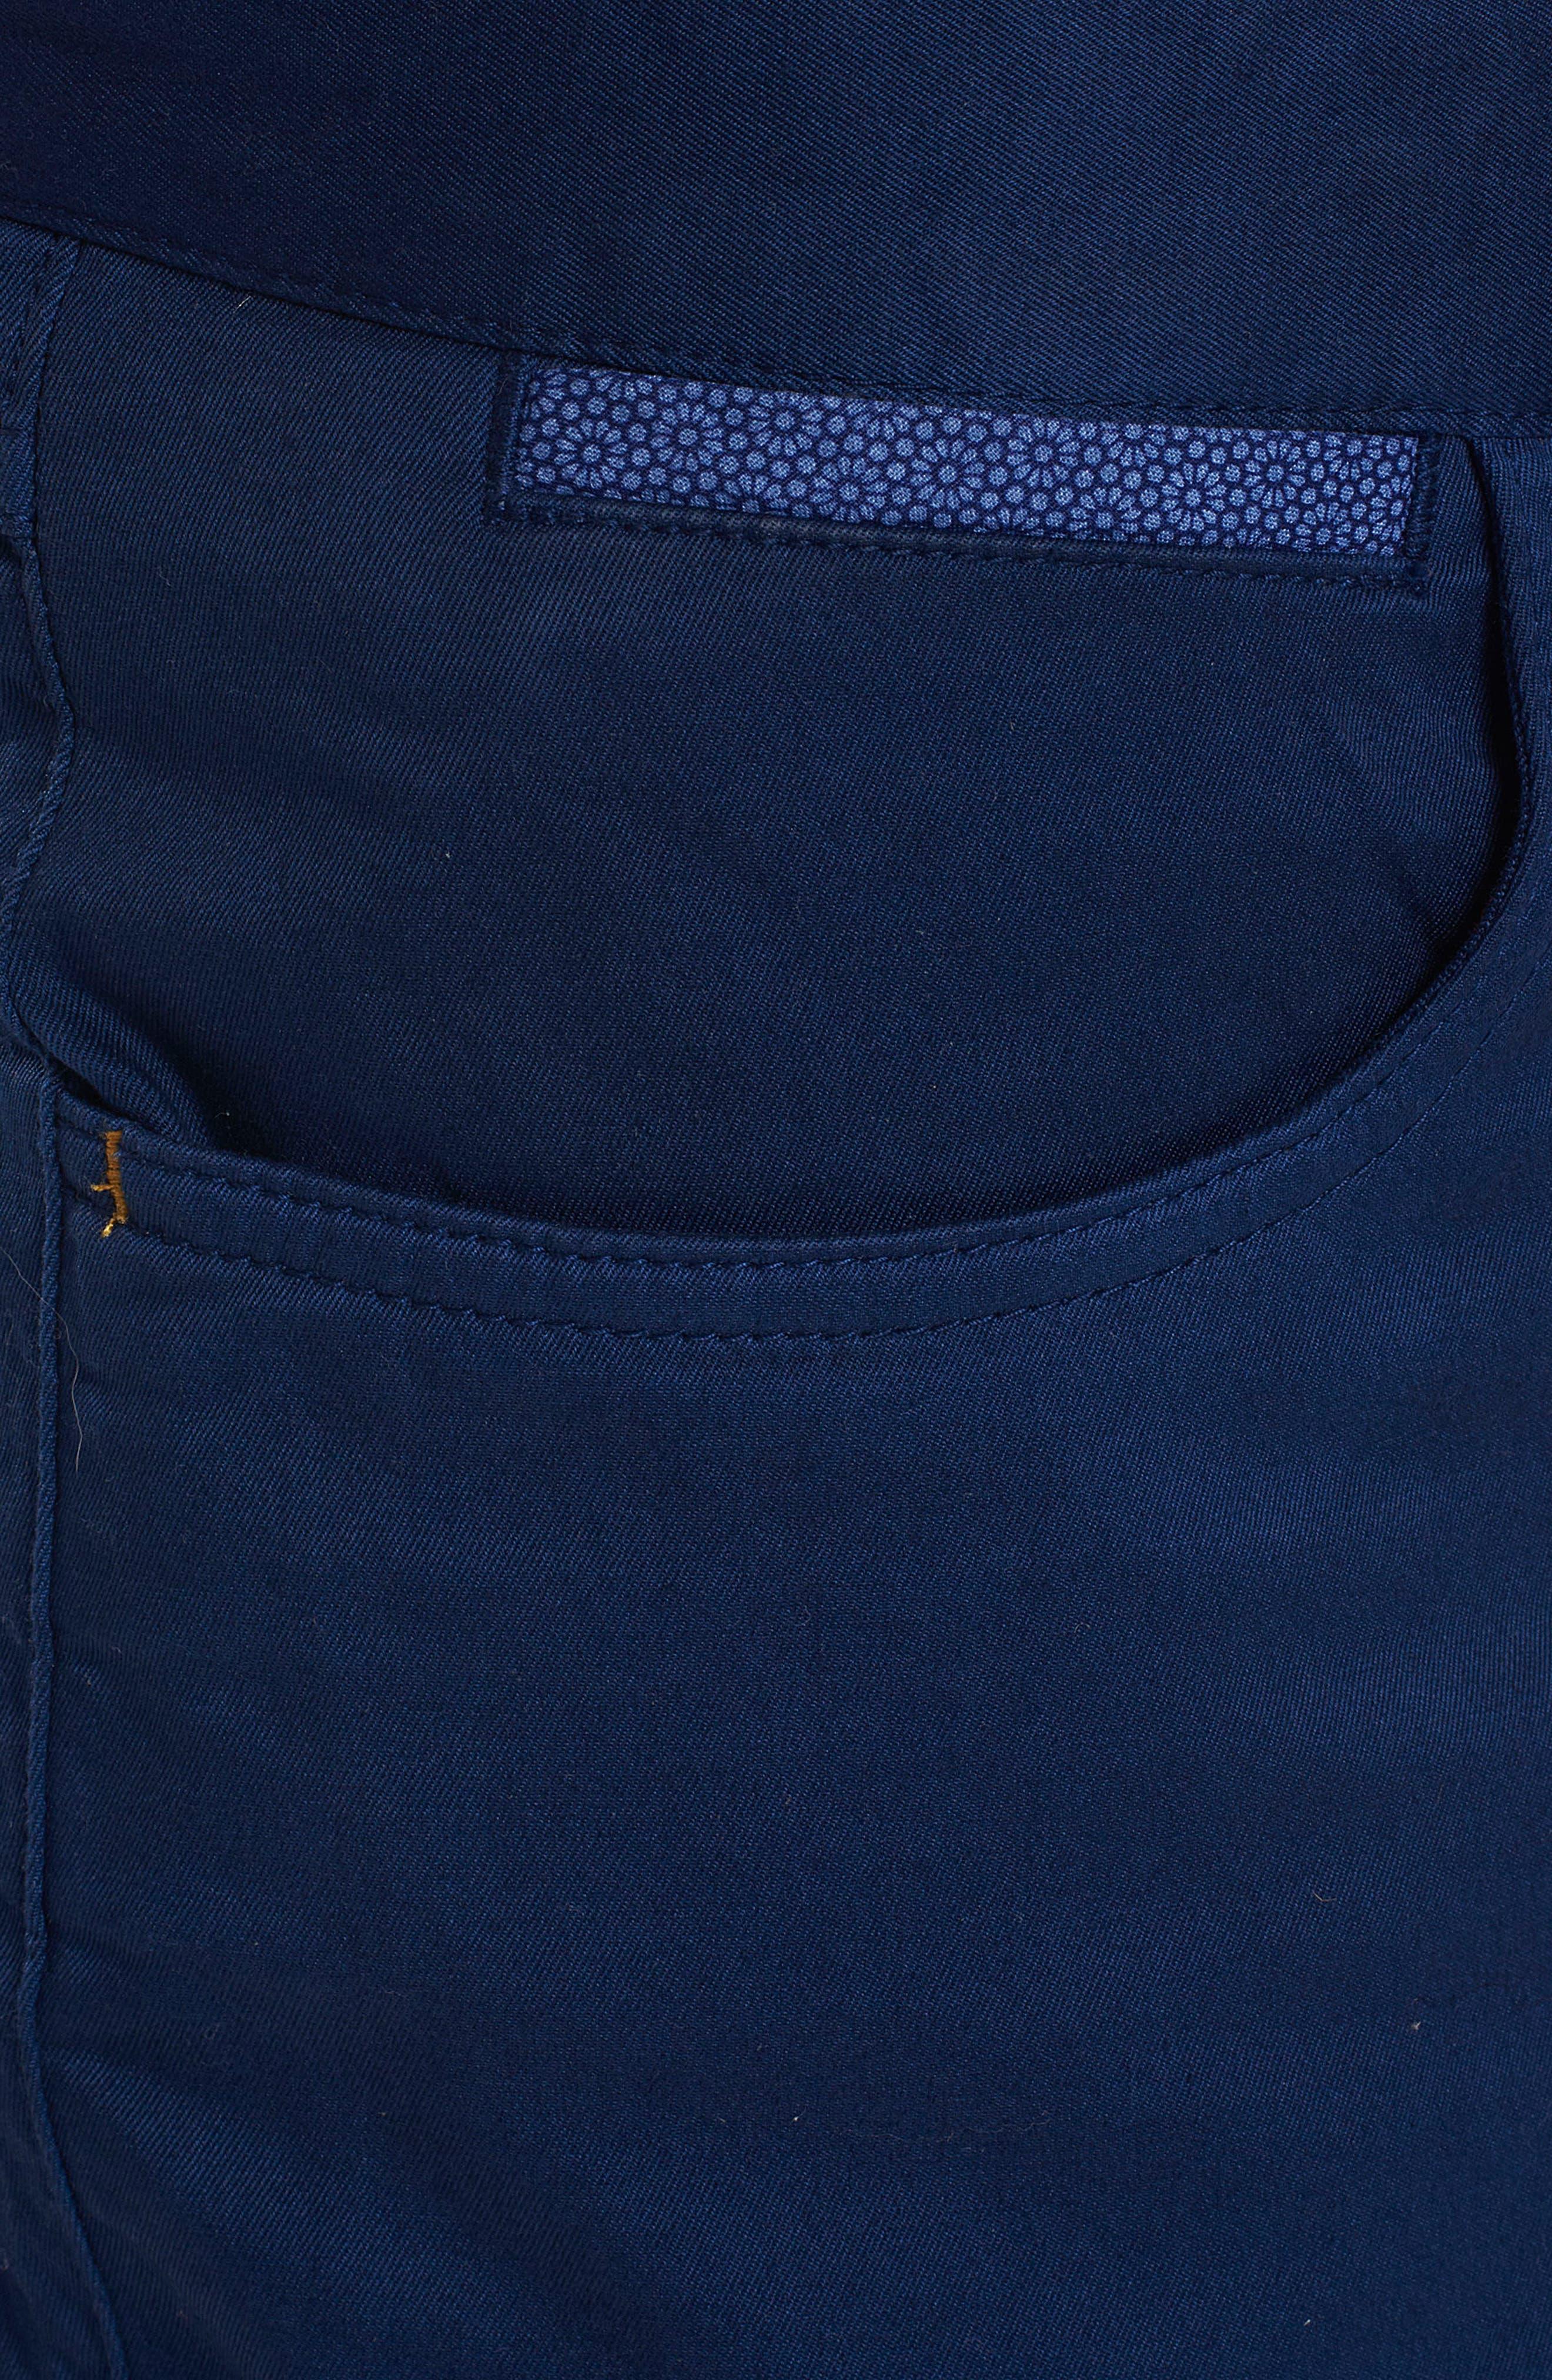 Marti Tailored Fit Pants,                             Alternate thumbnail 4, color,                             BLUE